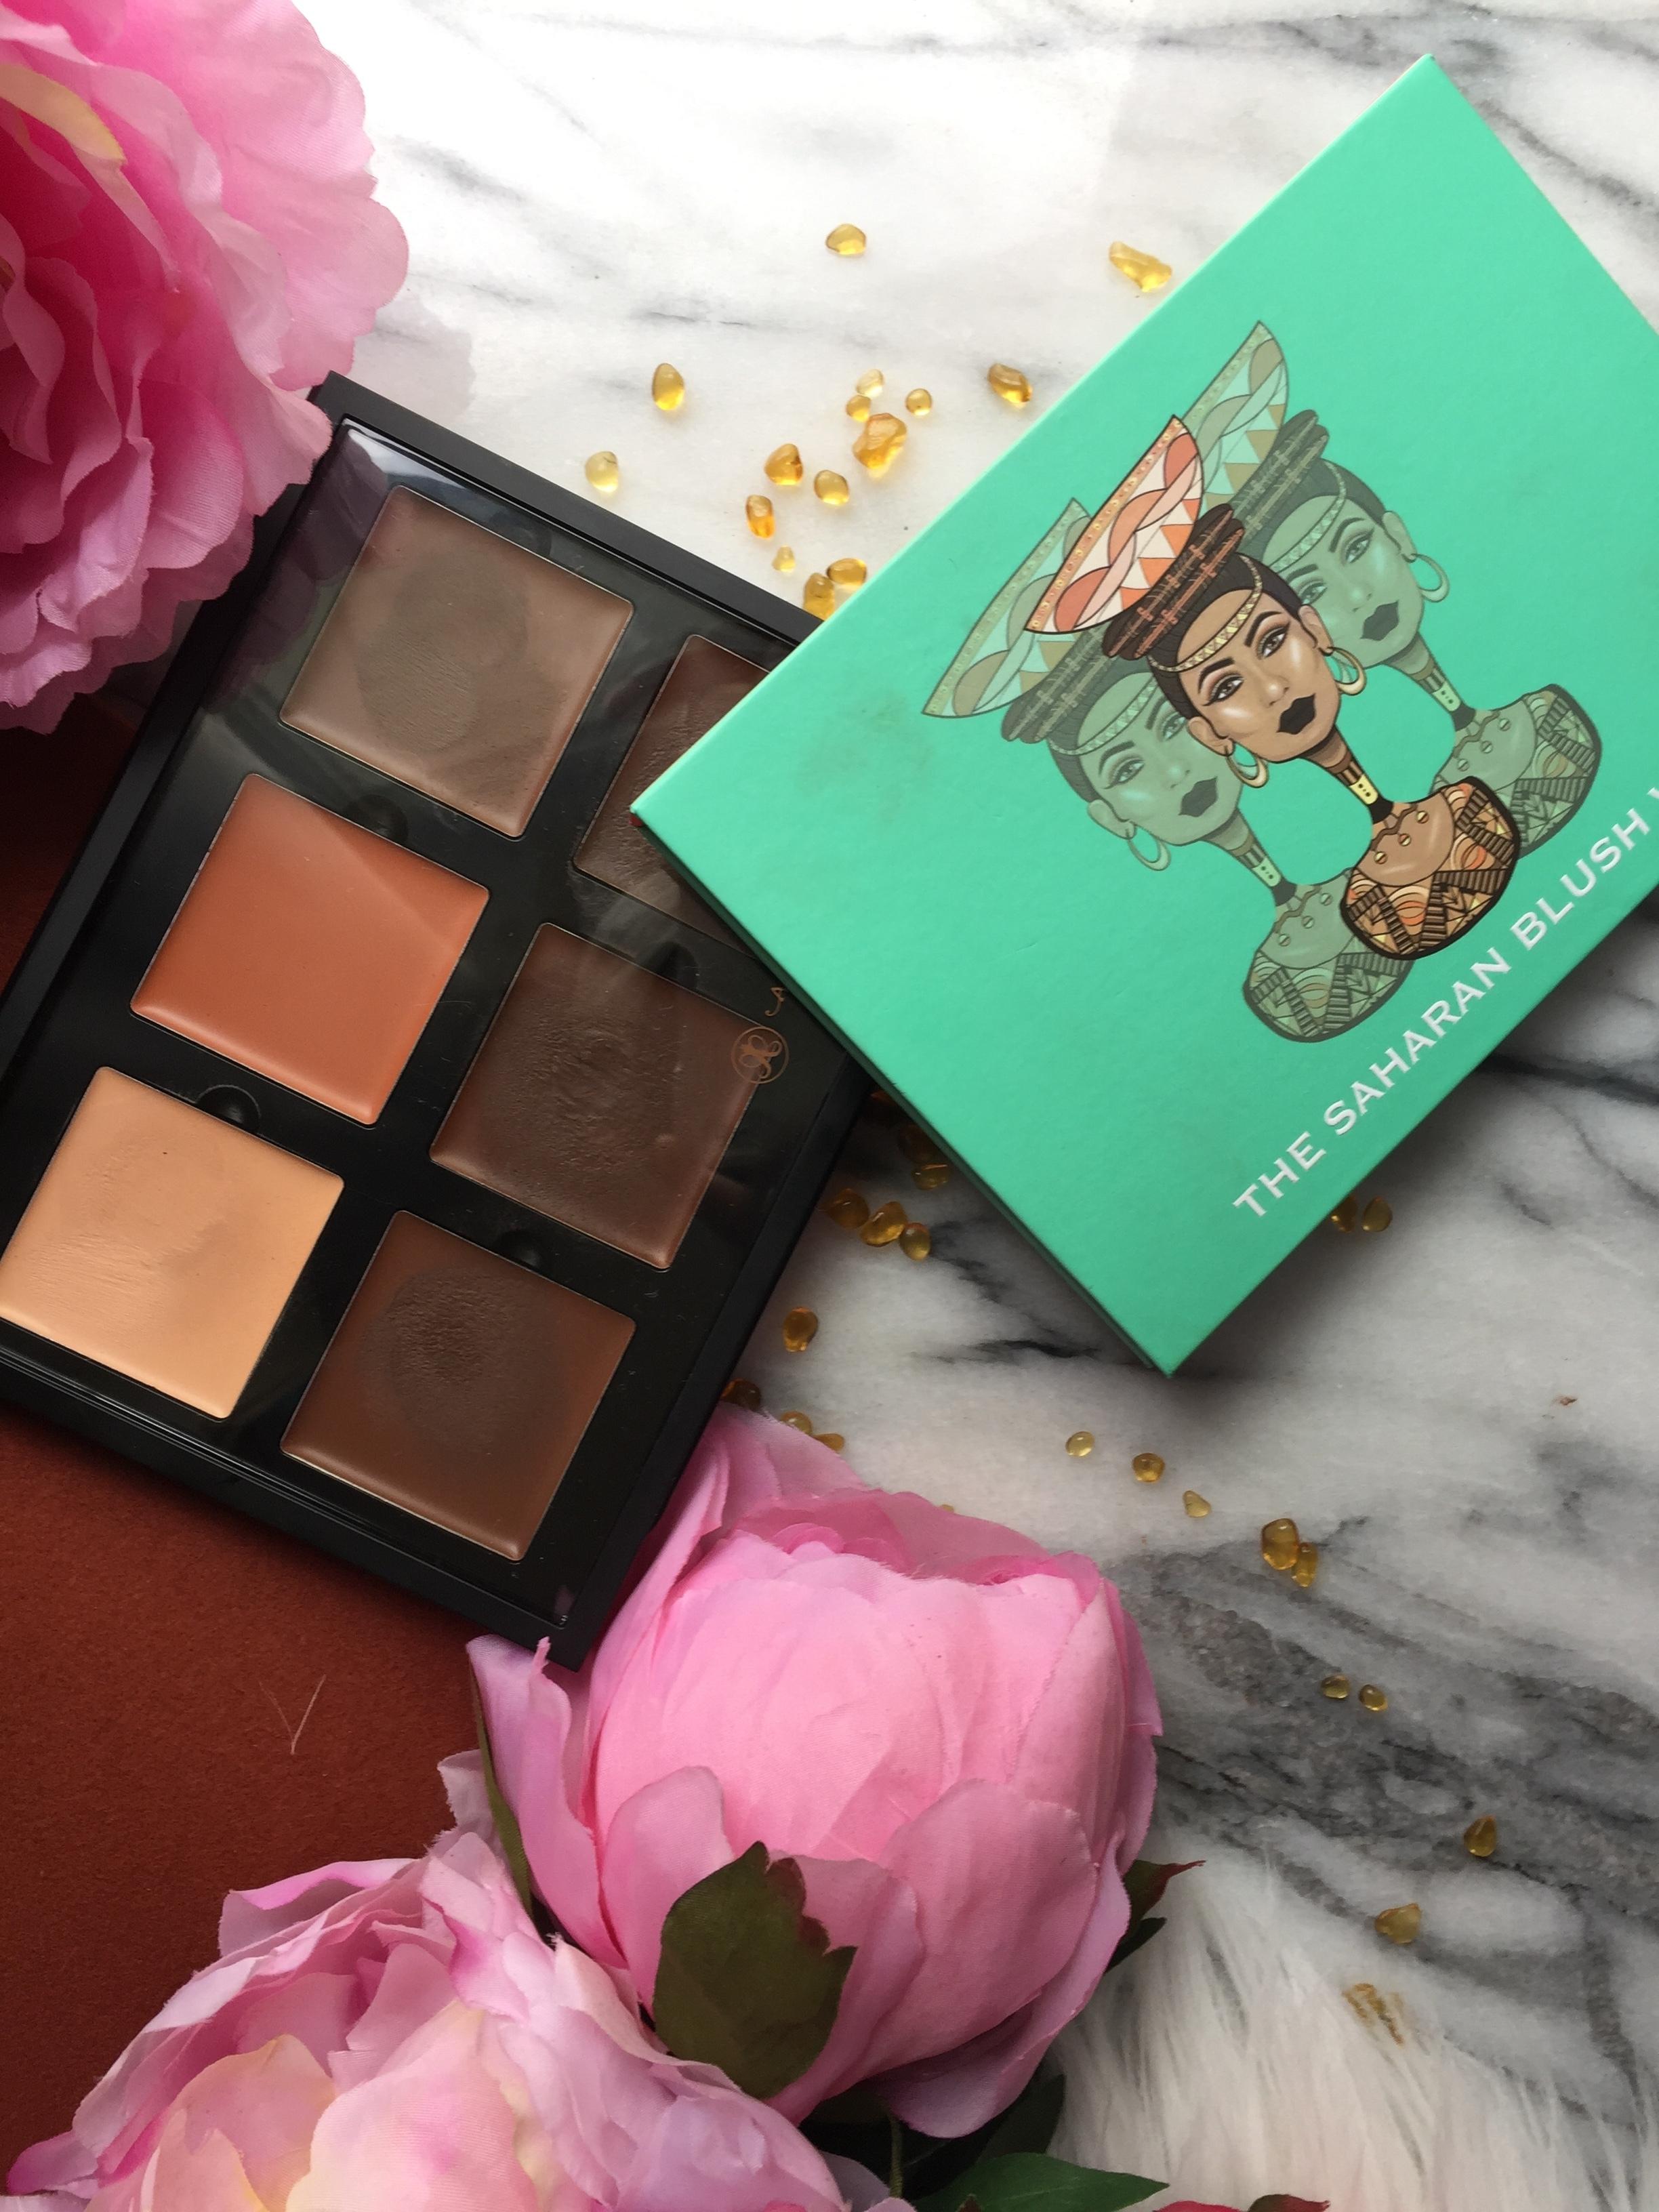 Anastasia Cream Contour Palette and Juvia's Place The Saharan Blush Palette